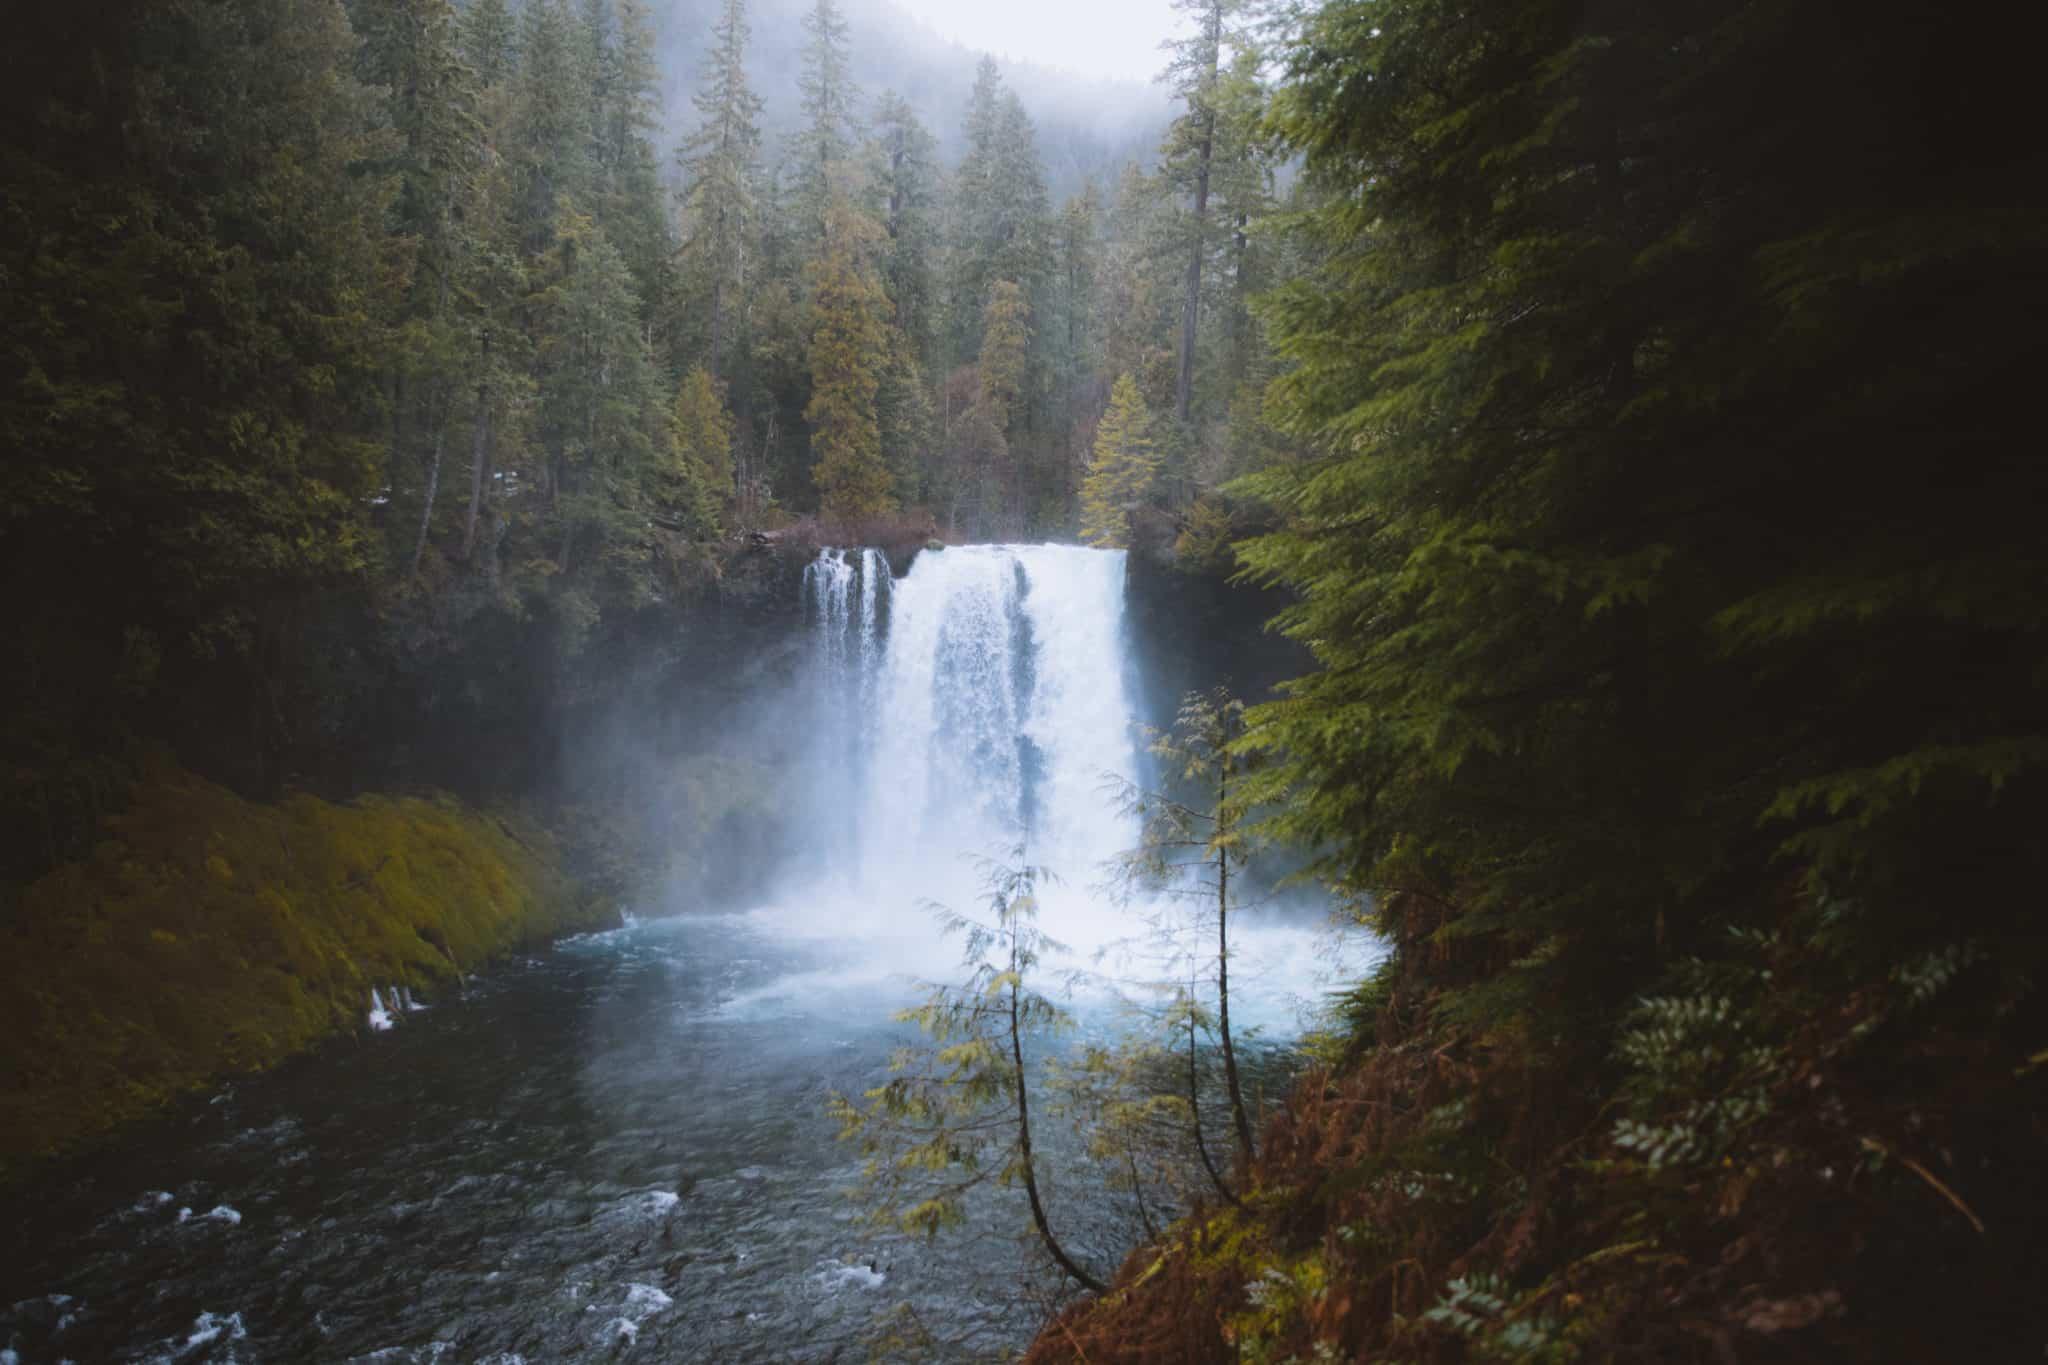 Koosah Falls - Hiking In The Pacific Northwest - TheMandagies.com